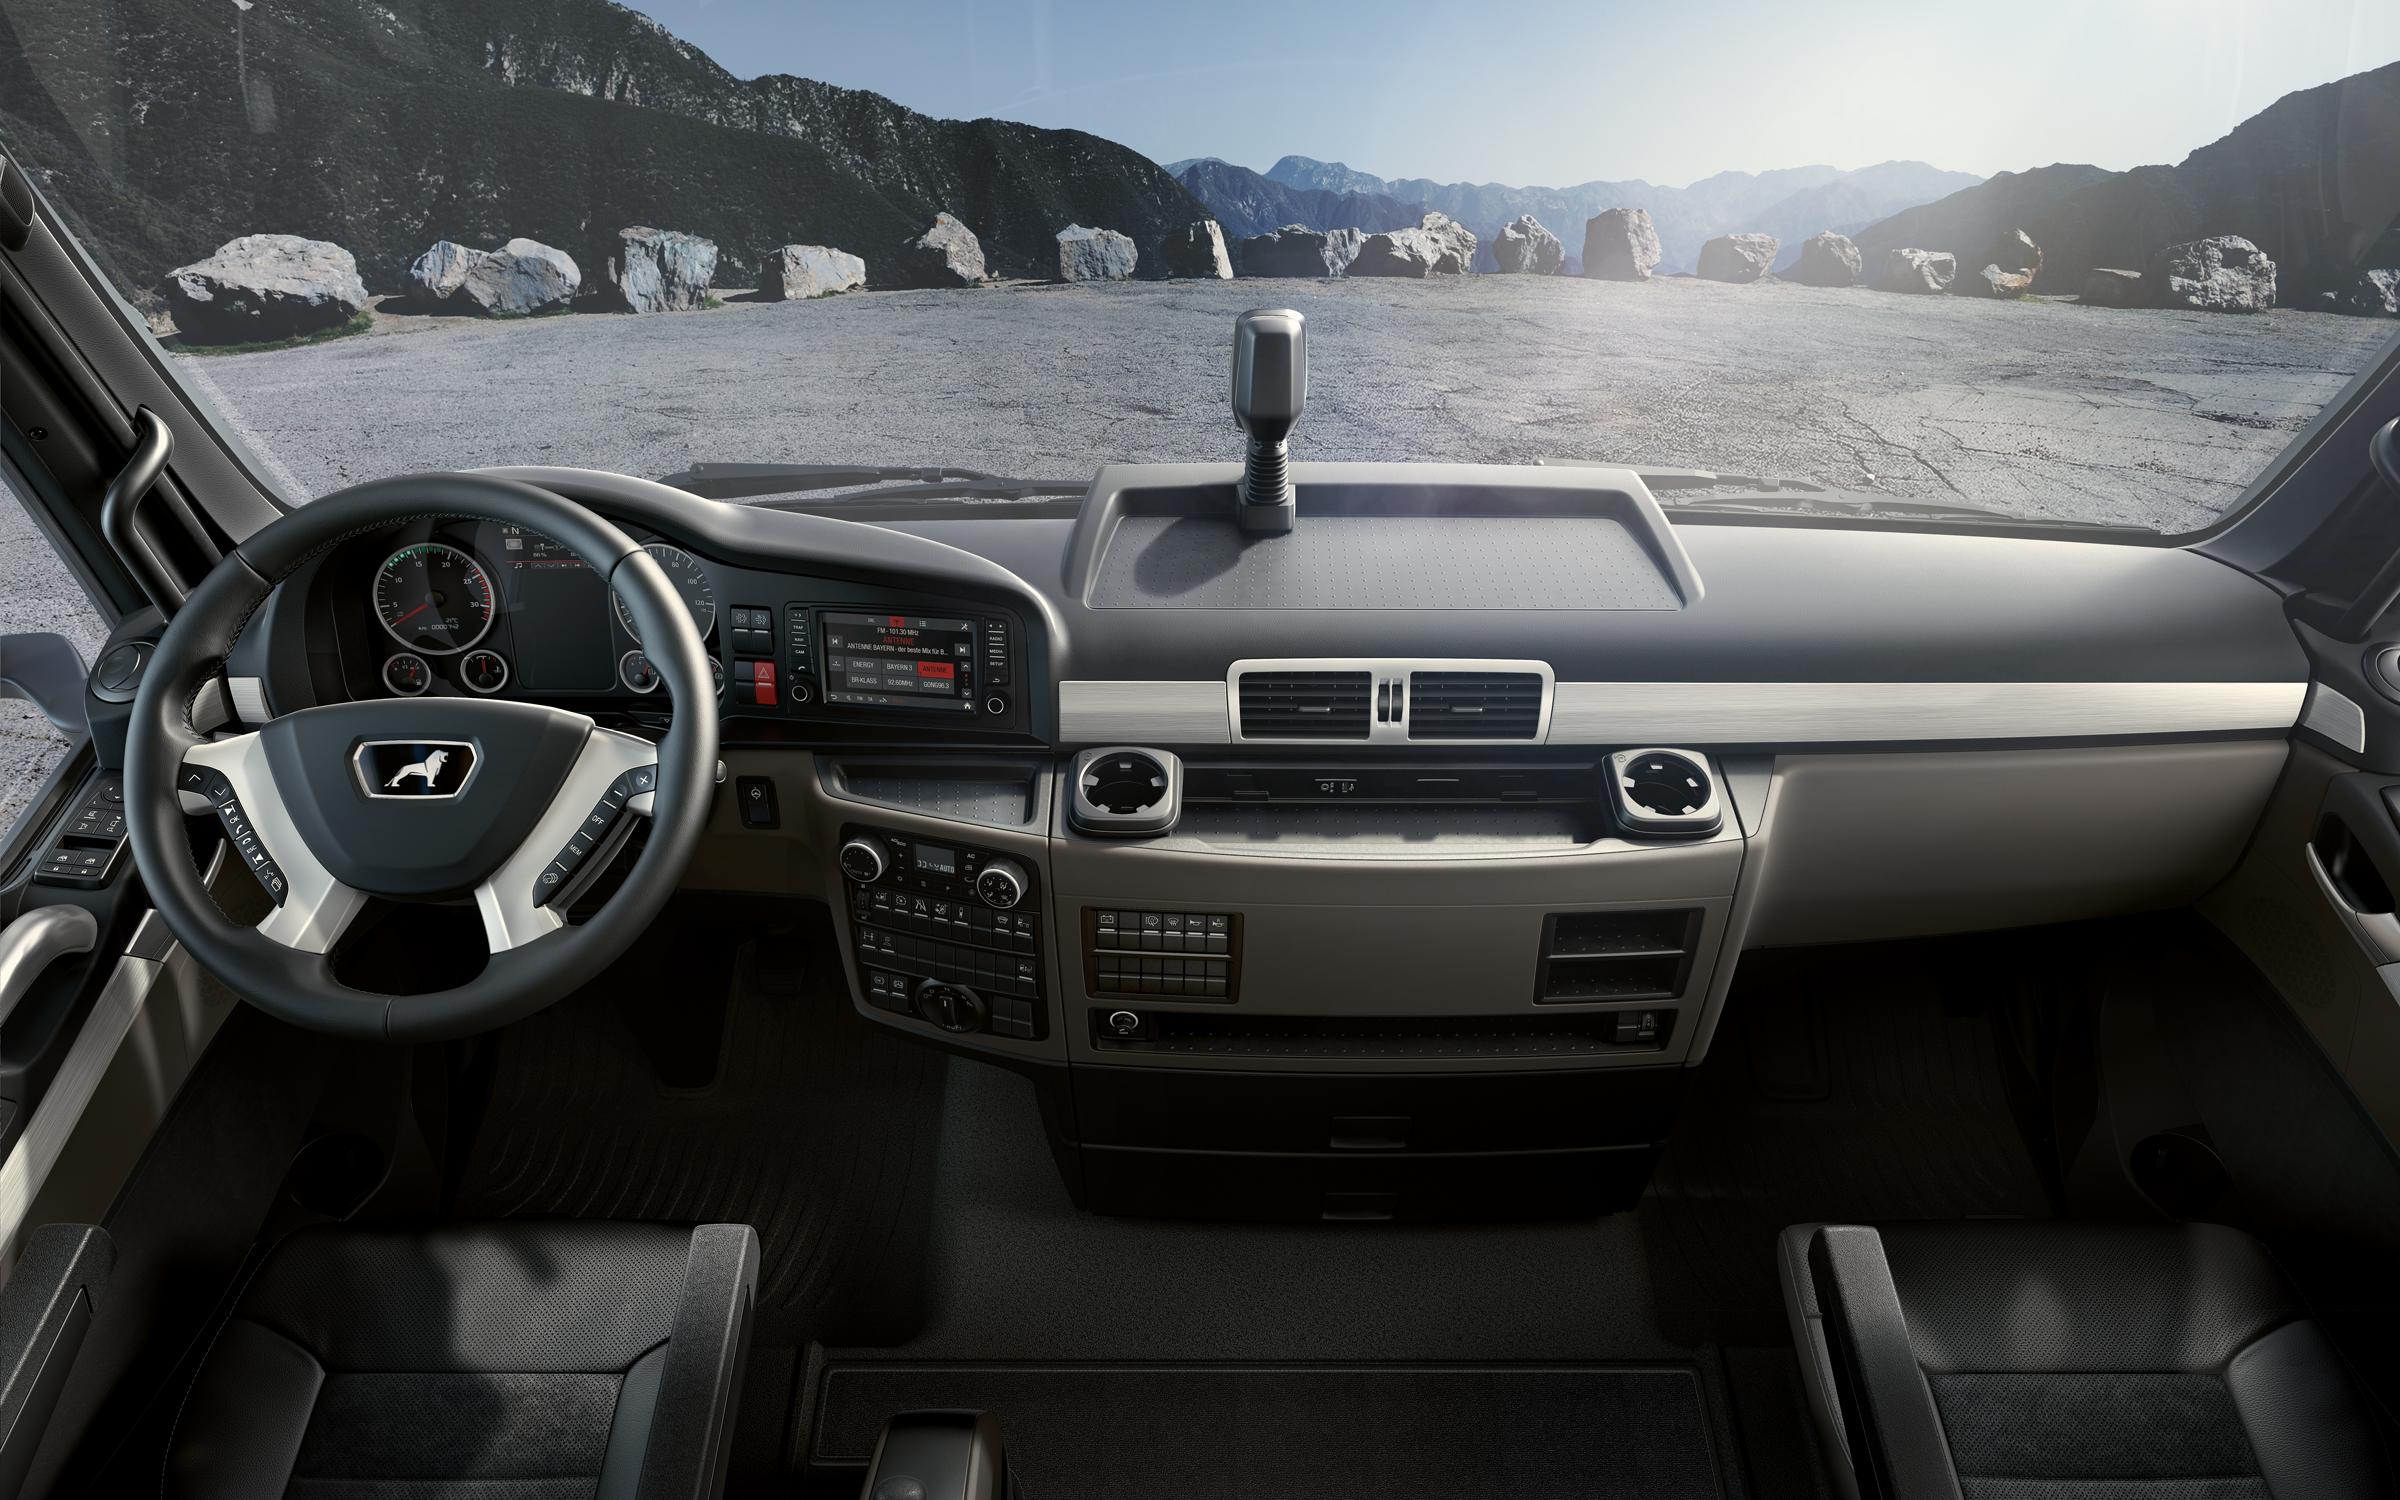 MAN TG Vehicles: Newly-designed interior | MAN Trucks United Kingdom